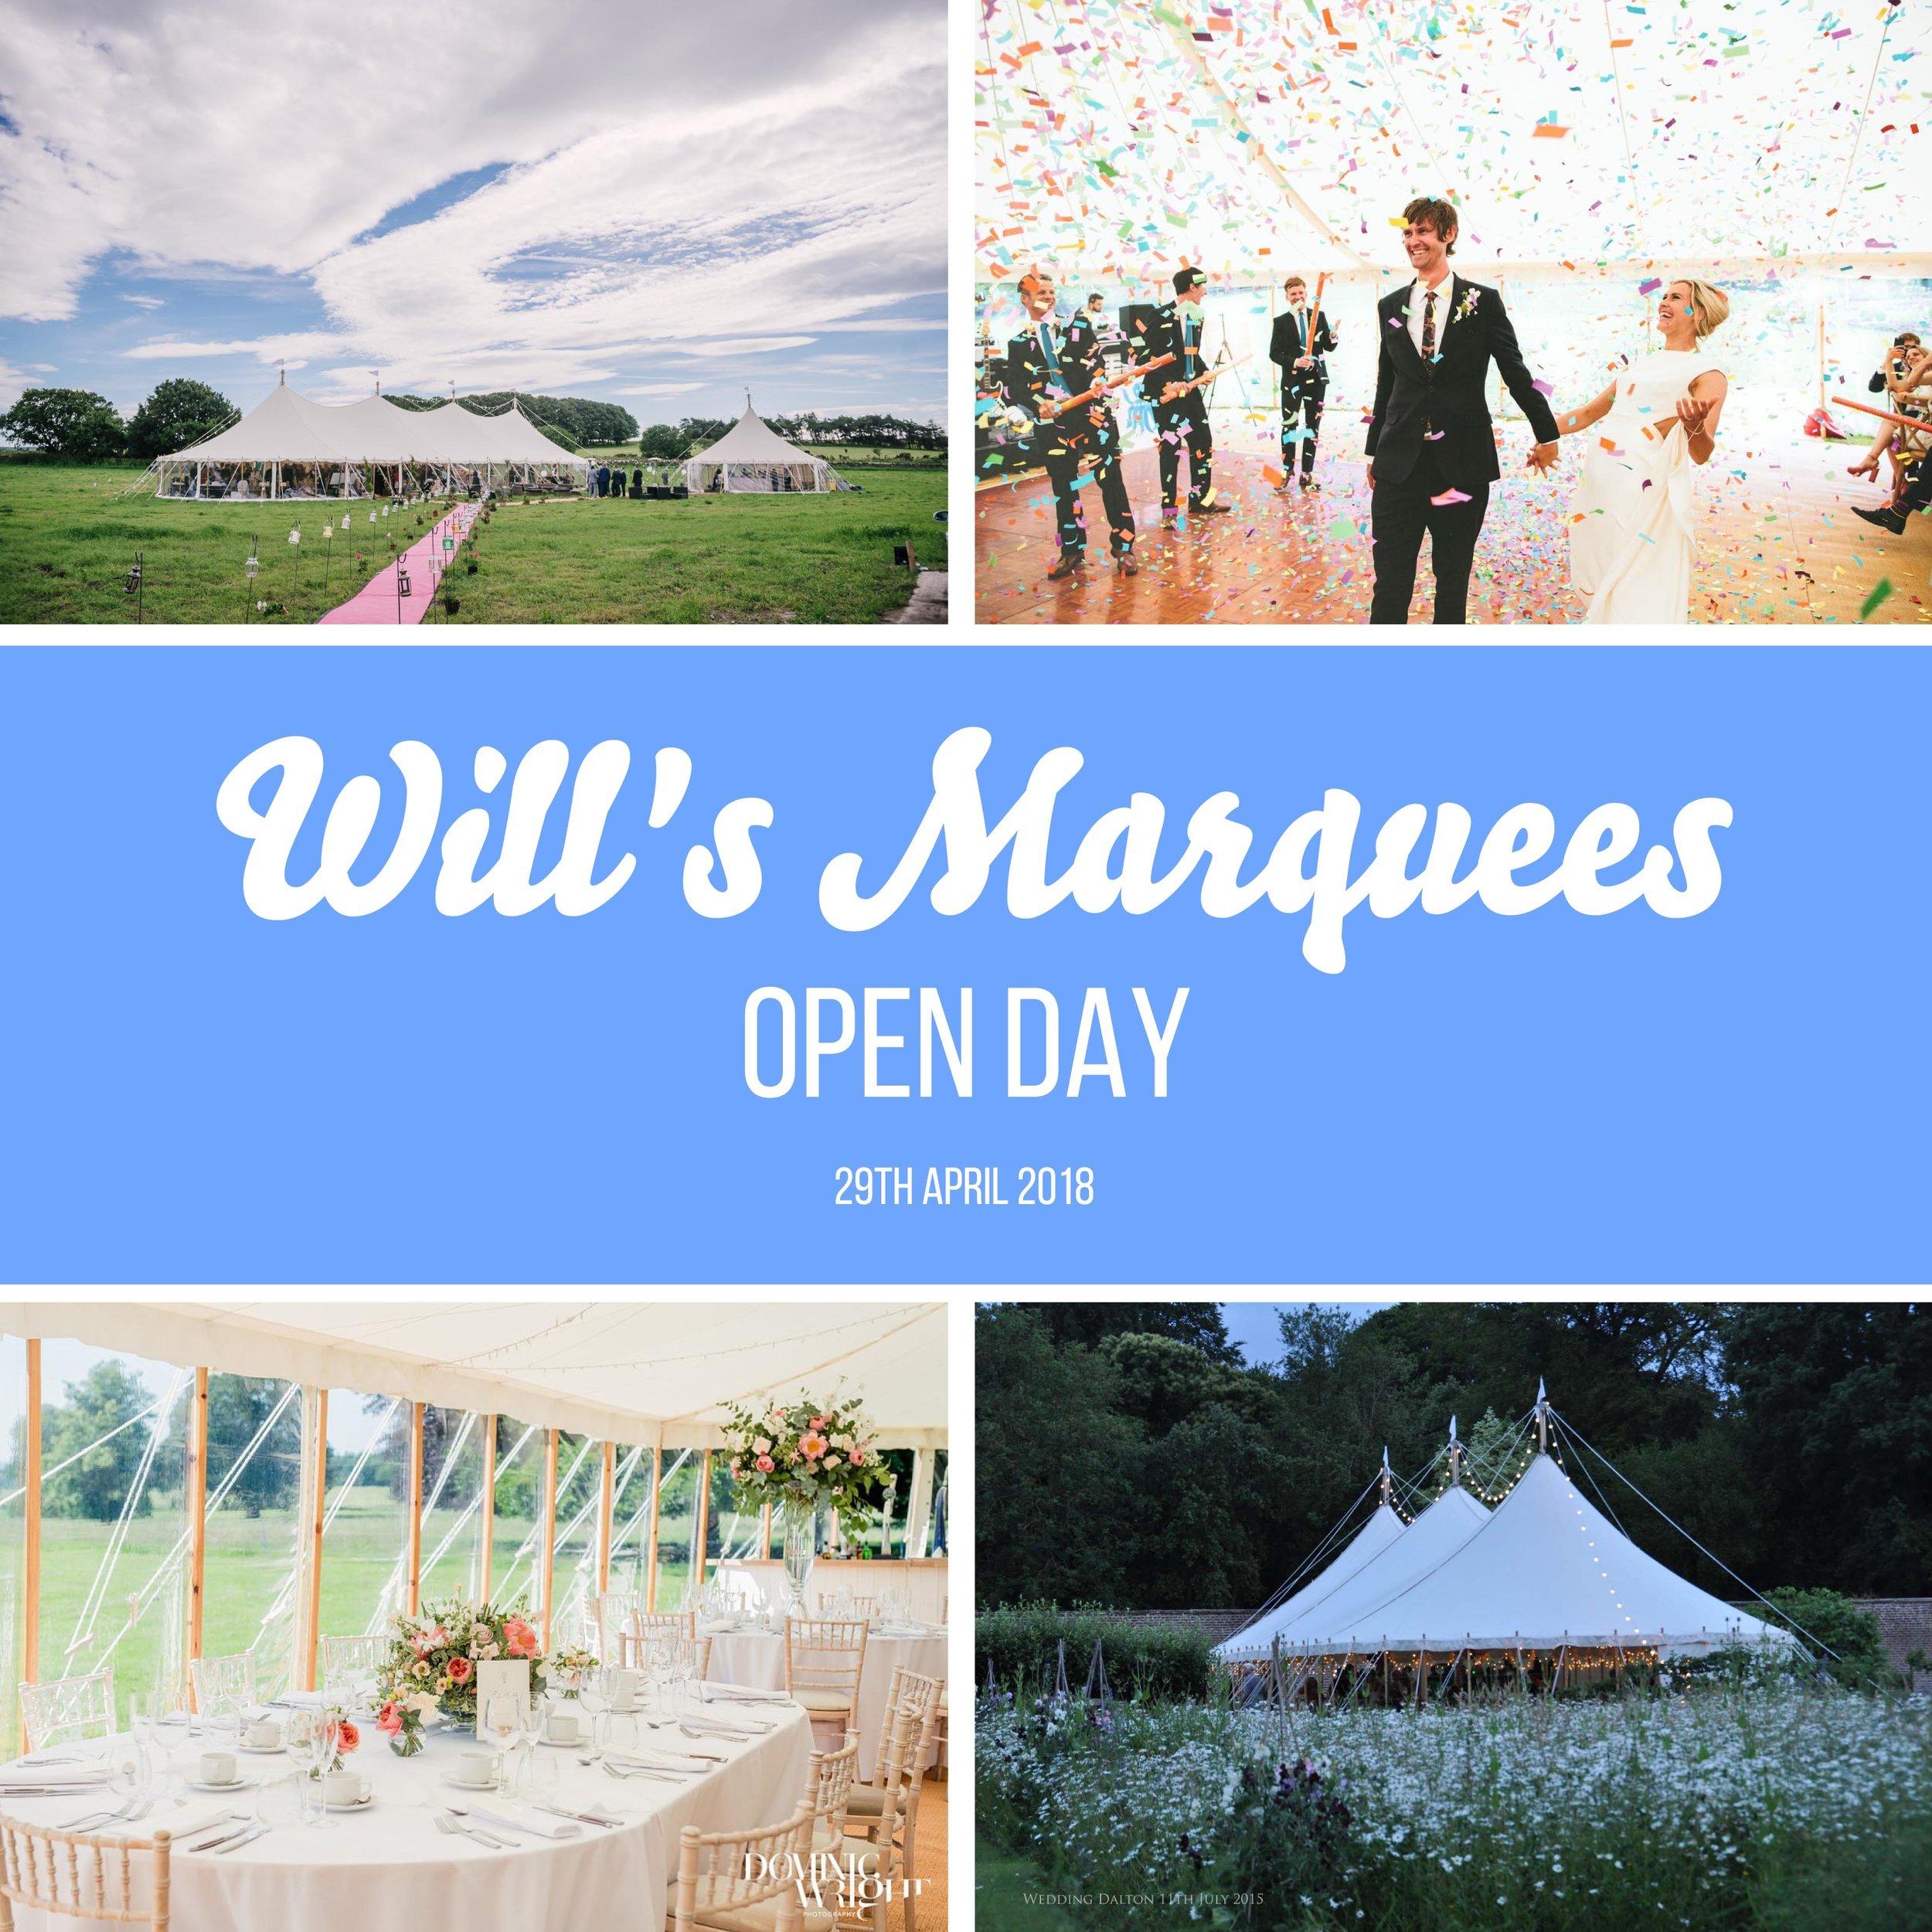 Open-Day-Invite-1.jpg